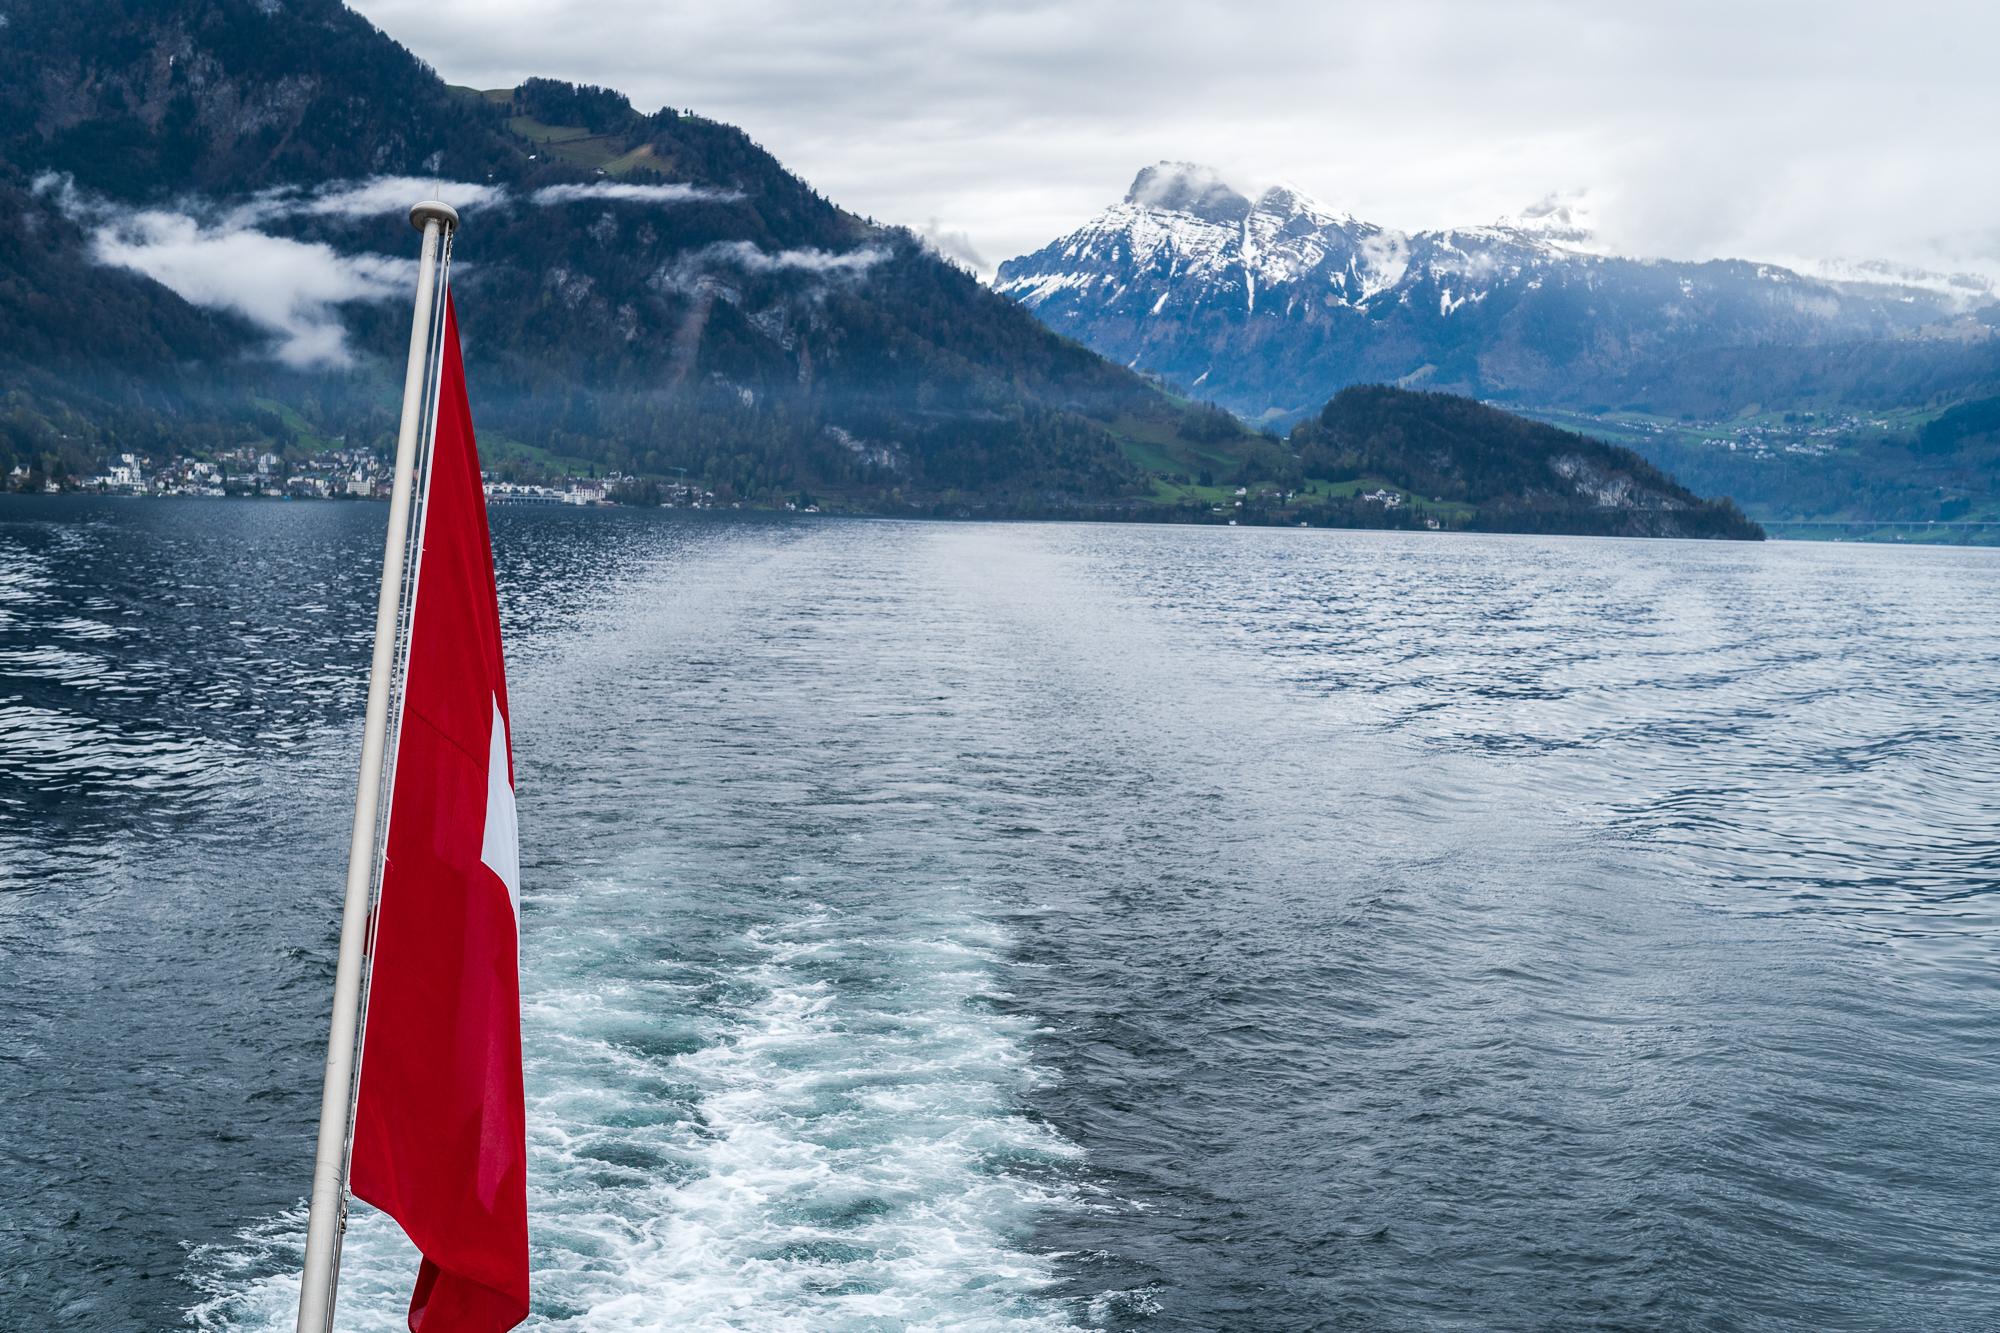 The boat ride to Vitznau